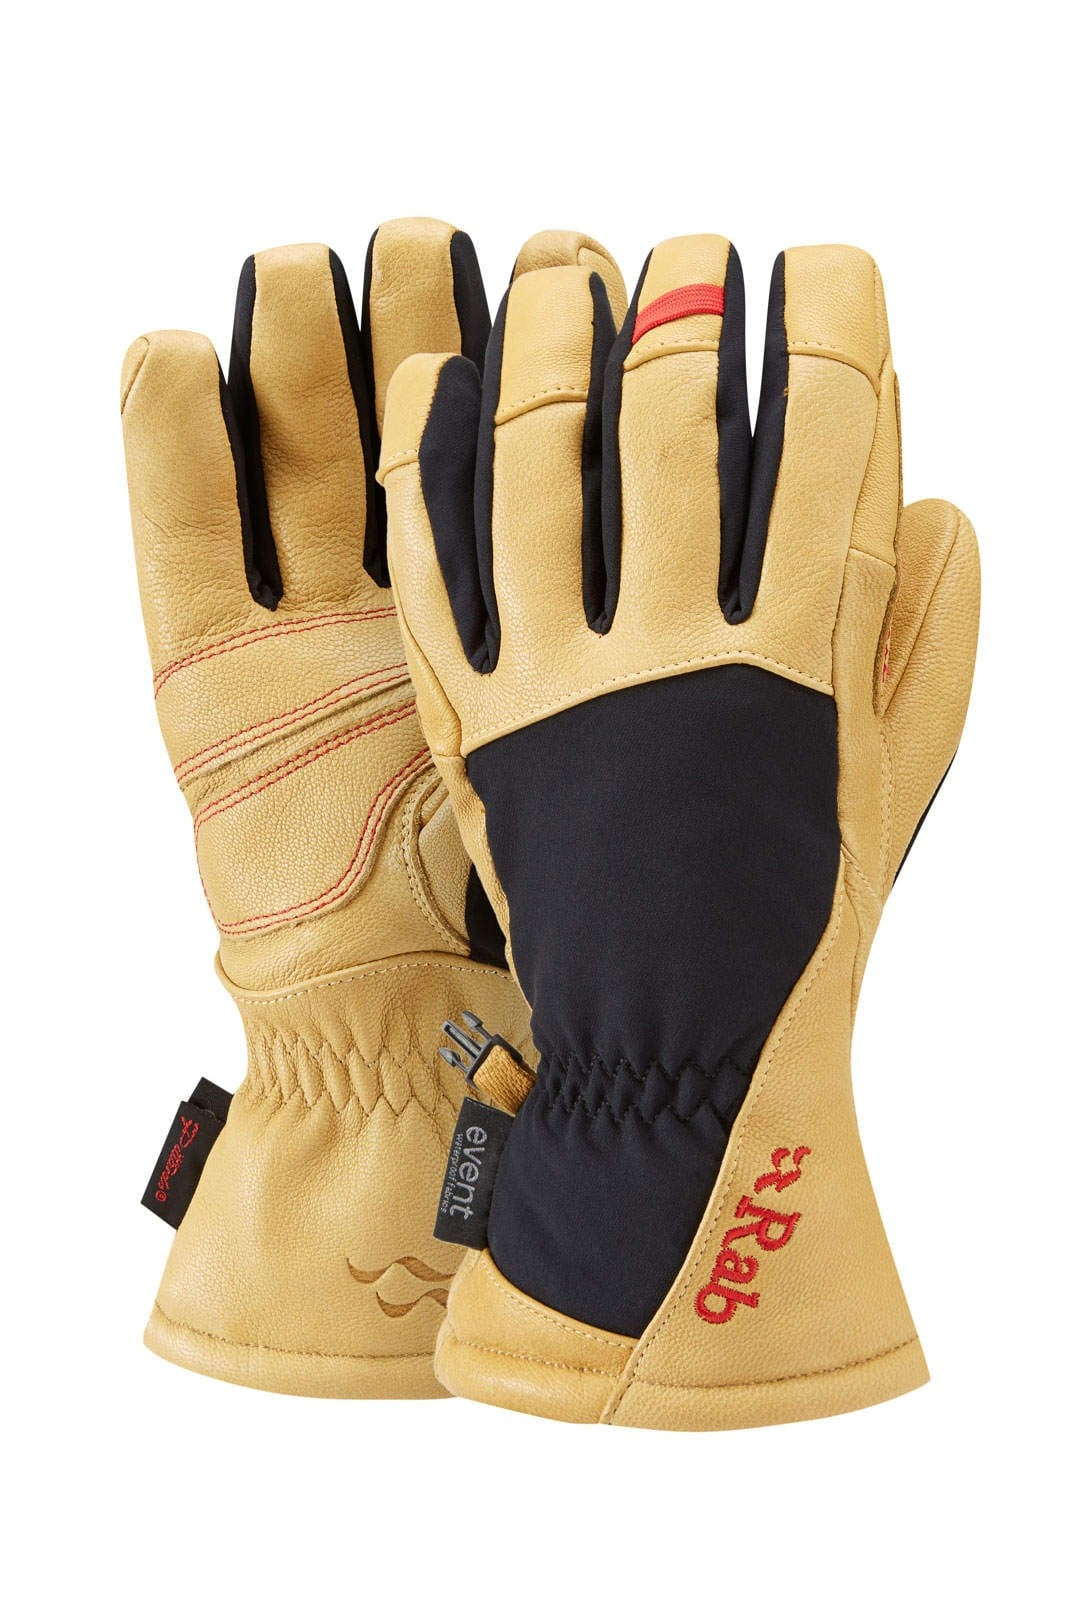 RAB Guide Glove, Kangaroo